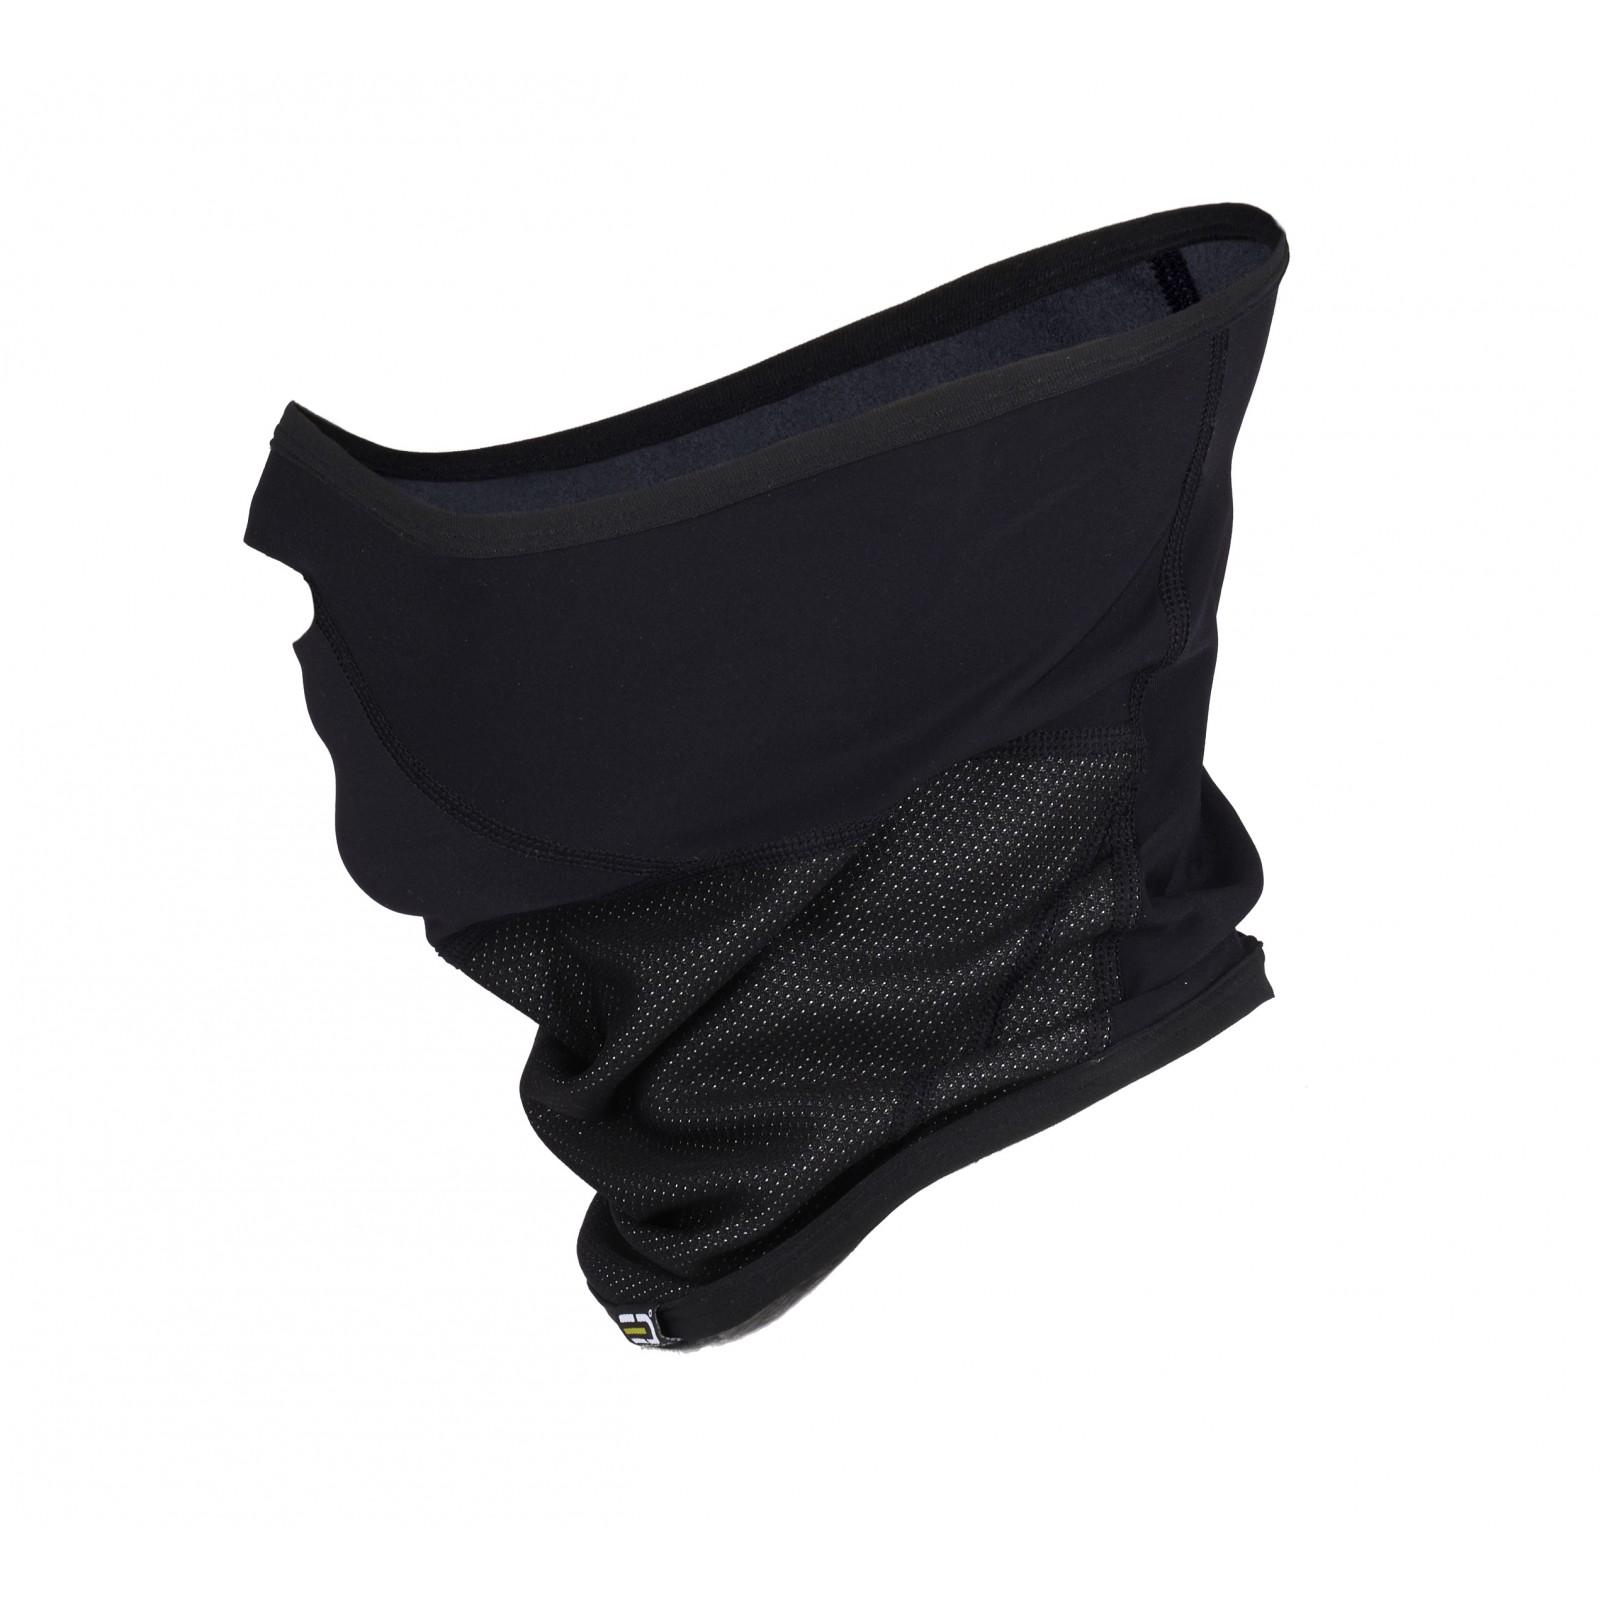 Wind&Rain Proof Mask Black